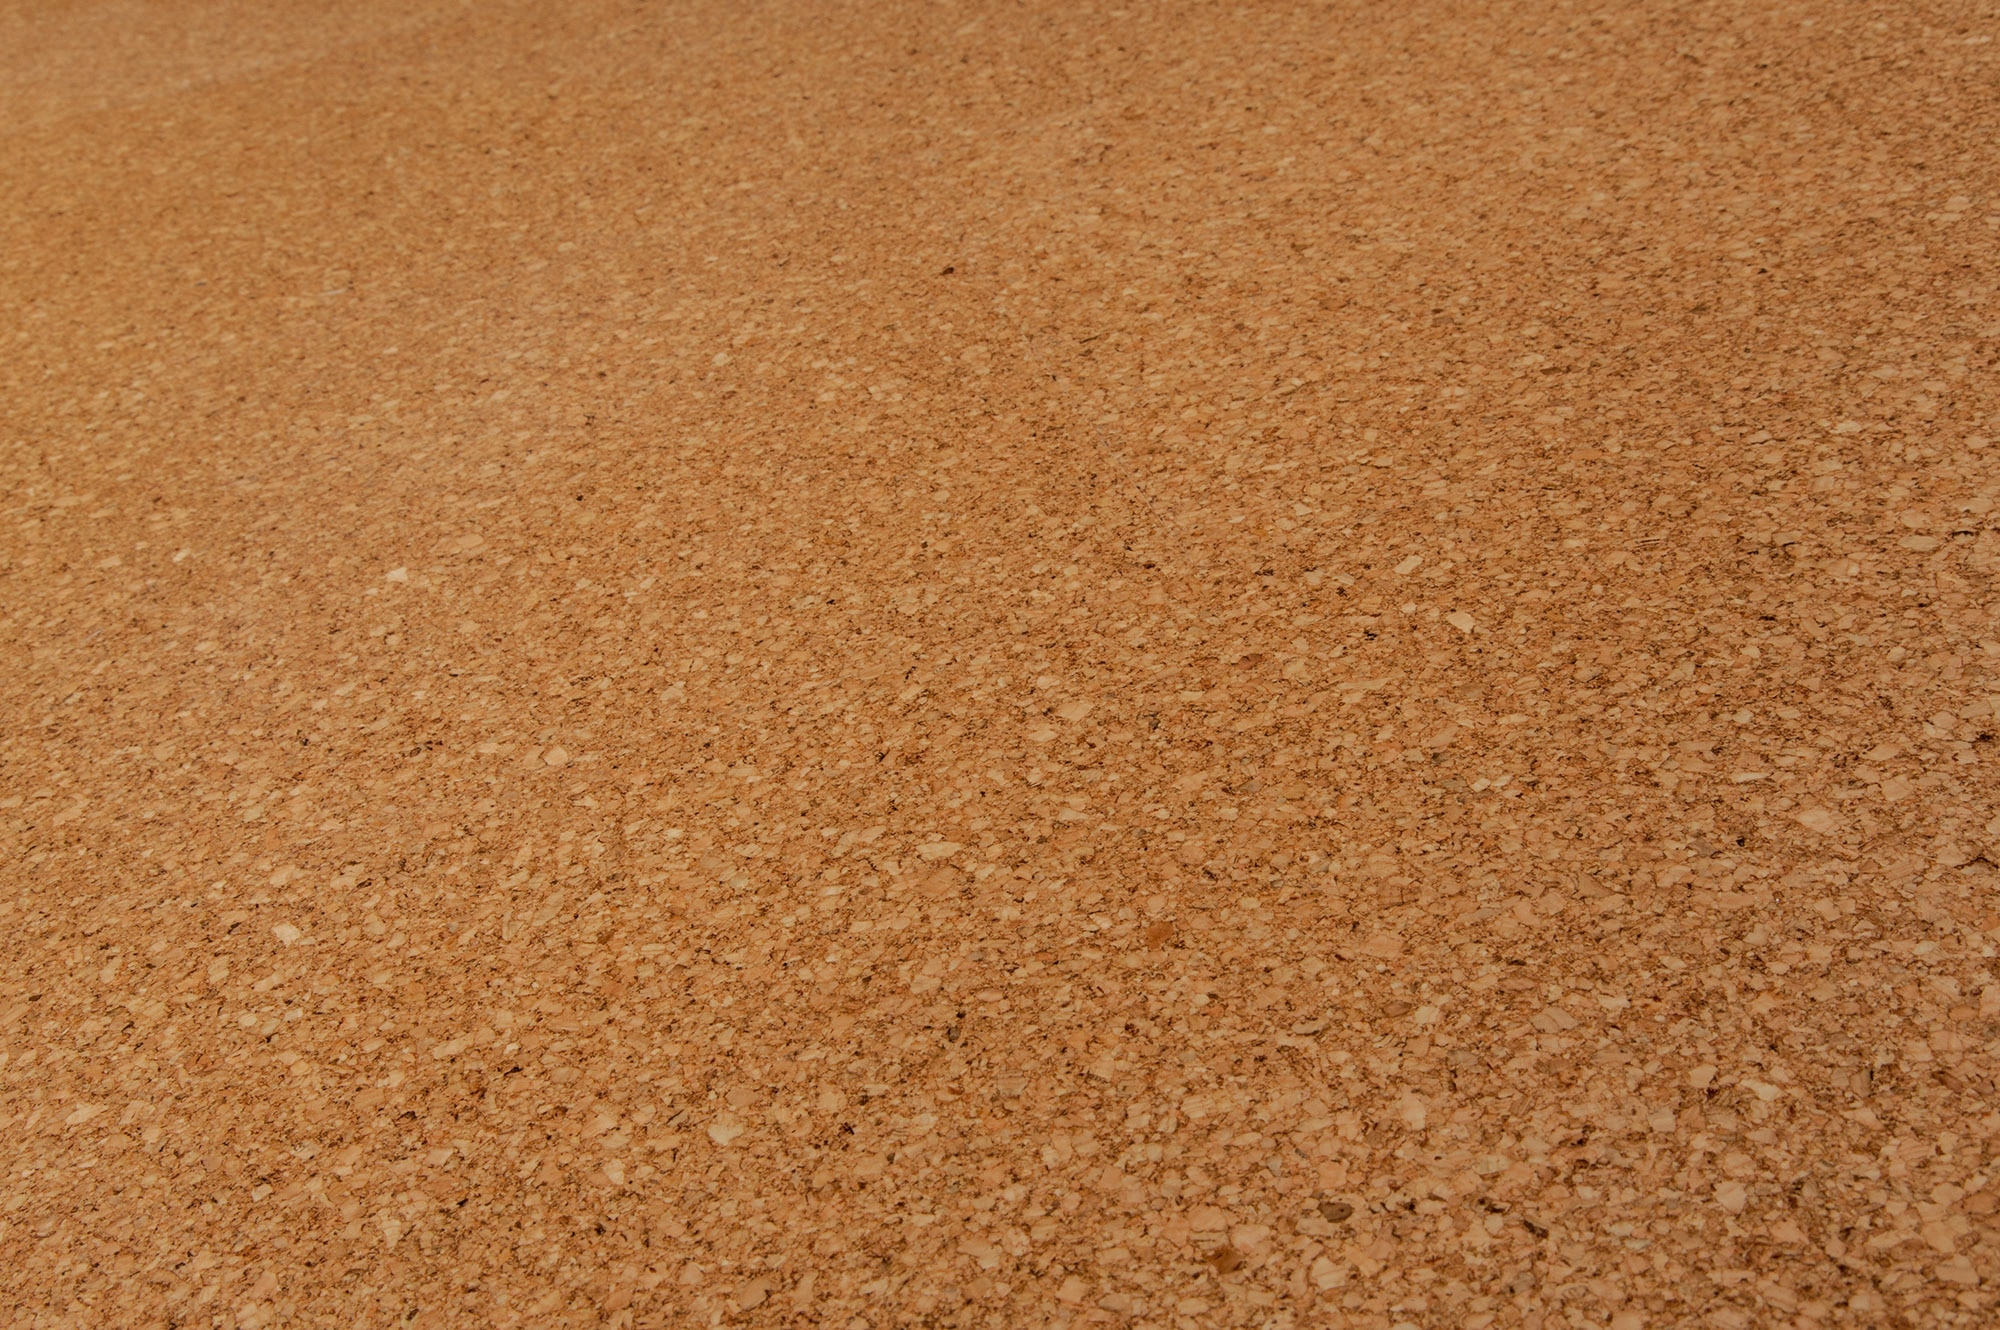 Cork flooring gallery of images about natural hardwood for Cork vs vinyl flooring